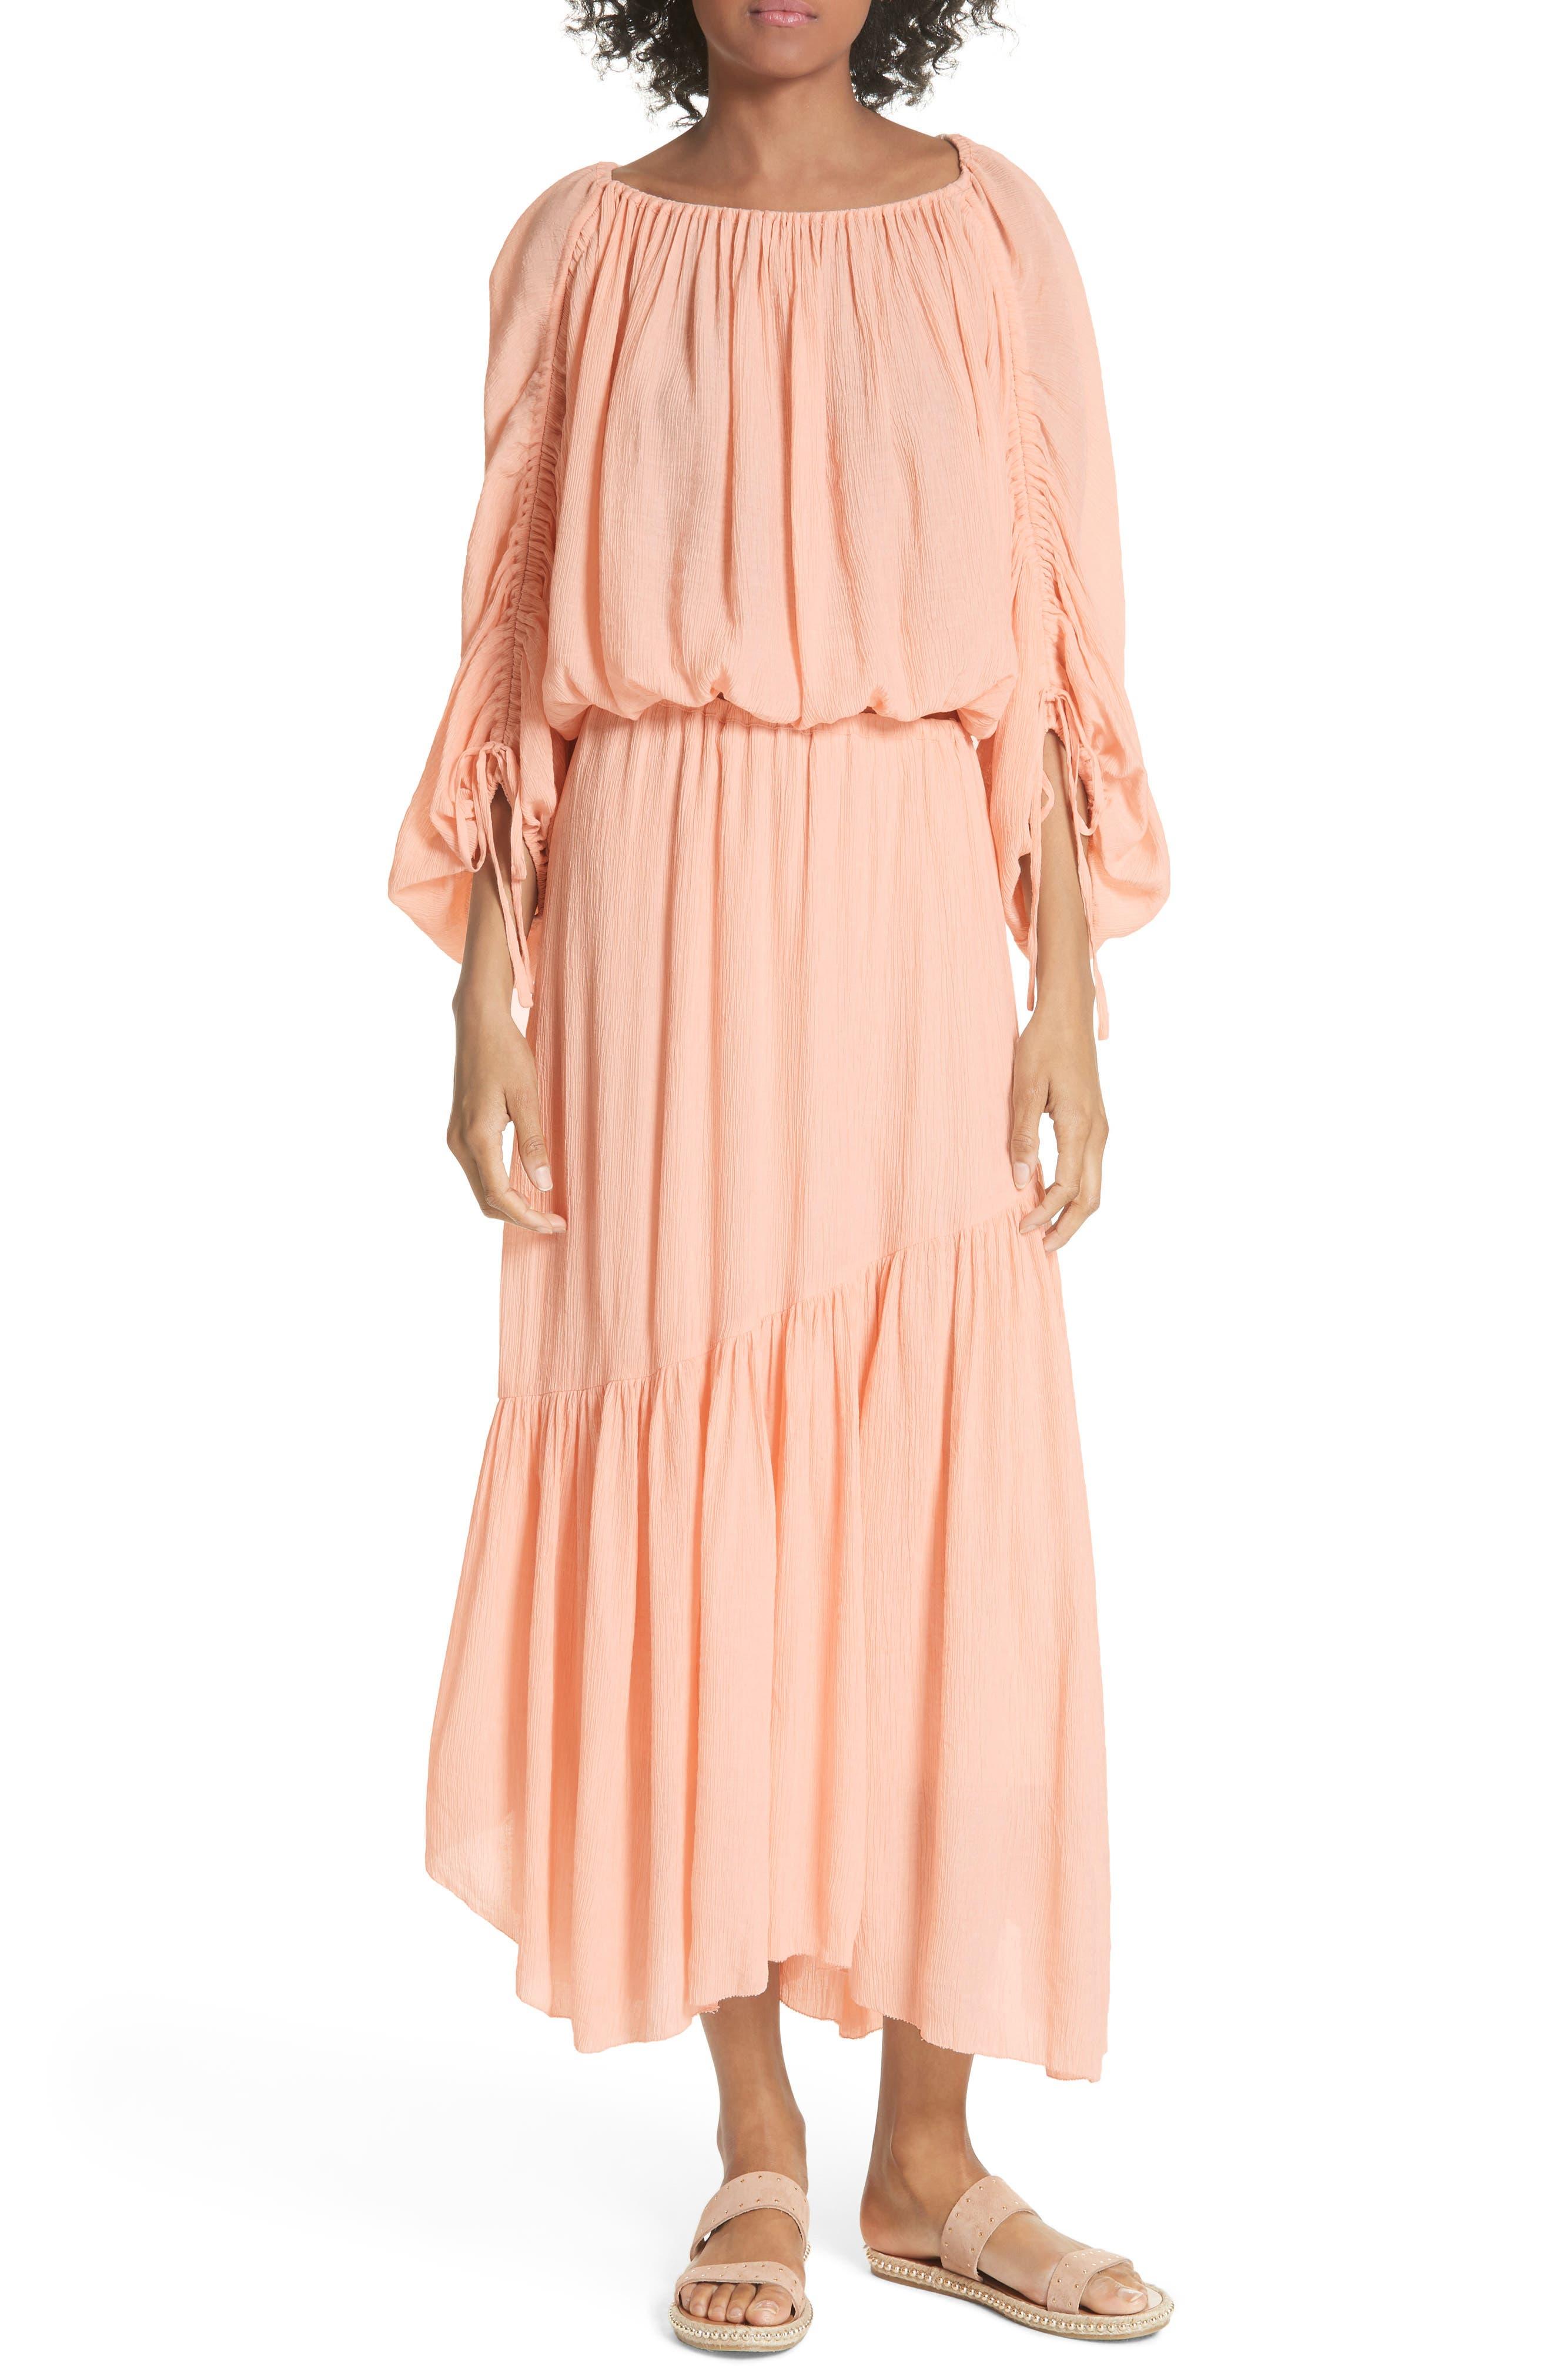 Elazara Ruched Sleeve Peasant Top,                             Alternate thumbnail 7, color,                             Summer Pink